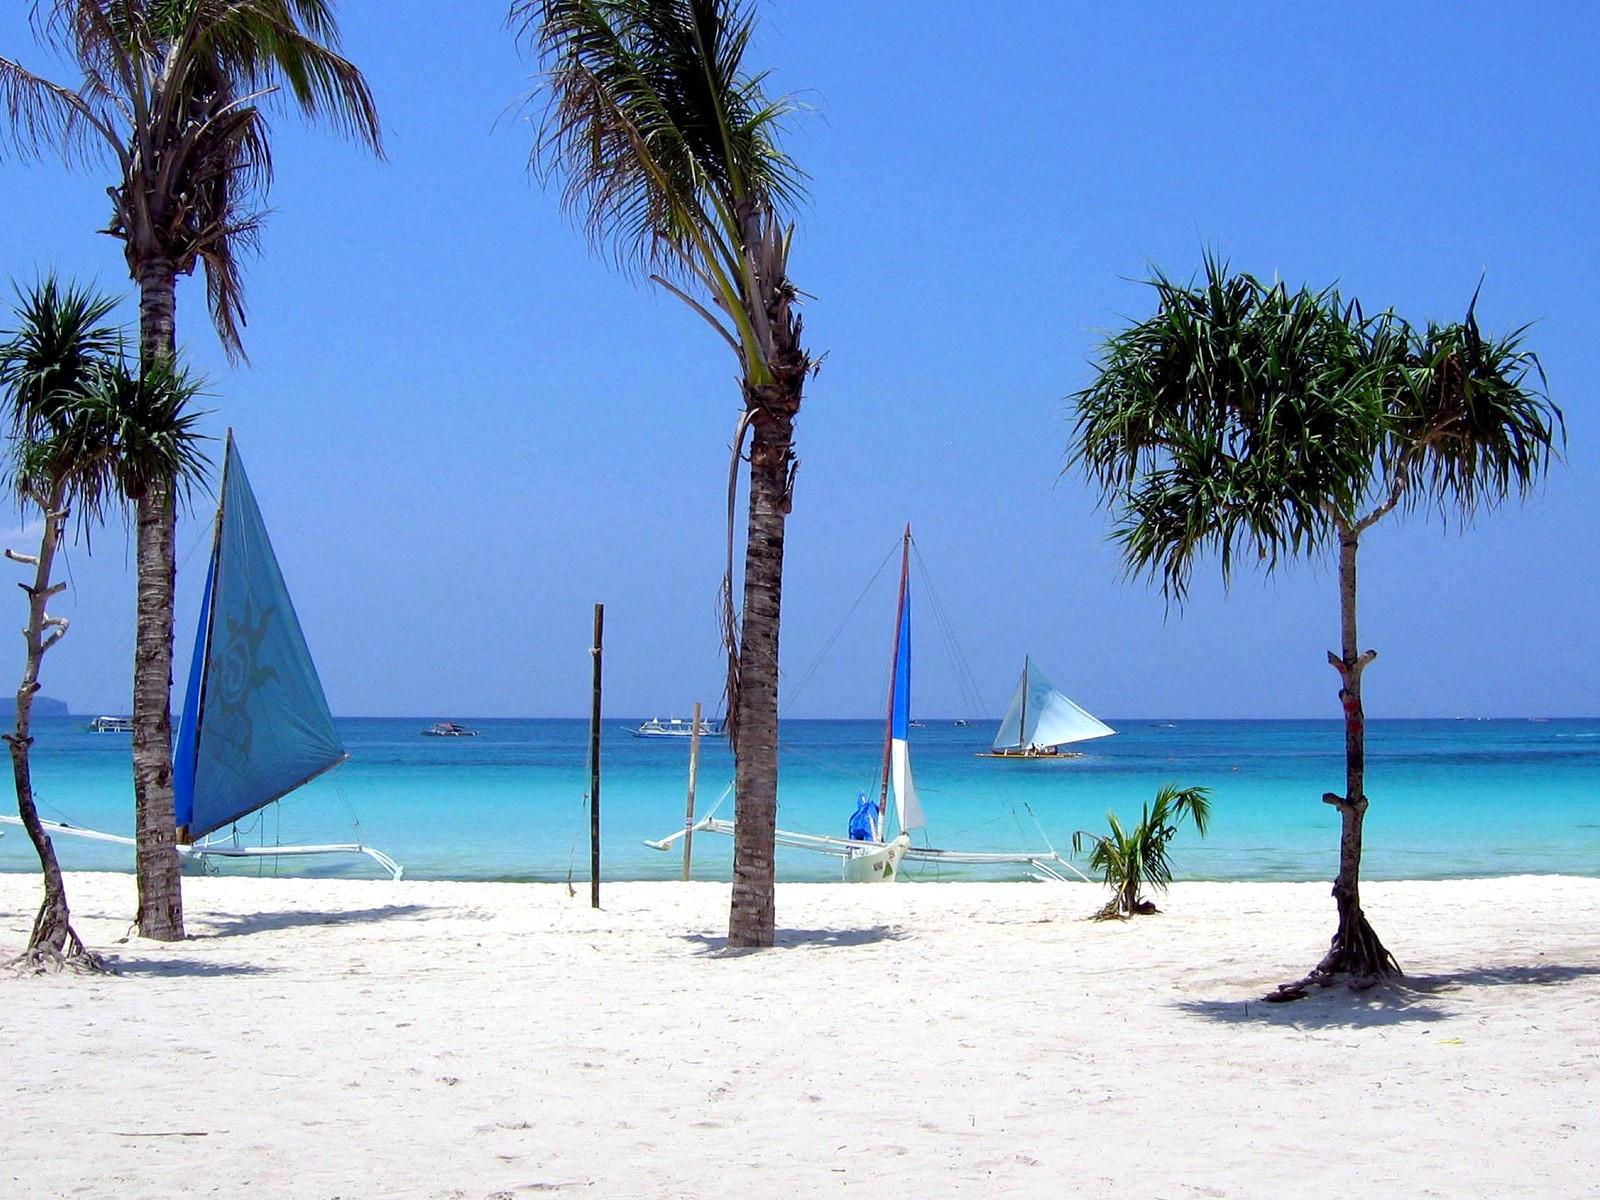 Katameran on the beach by puddlz